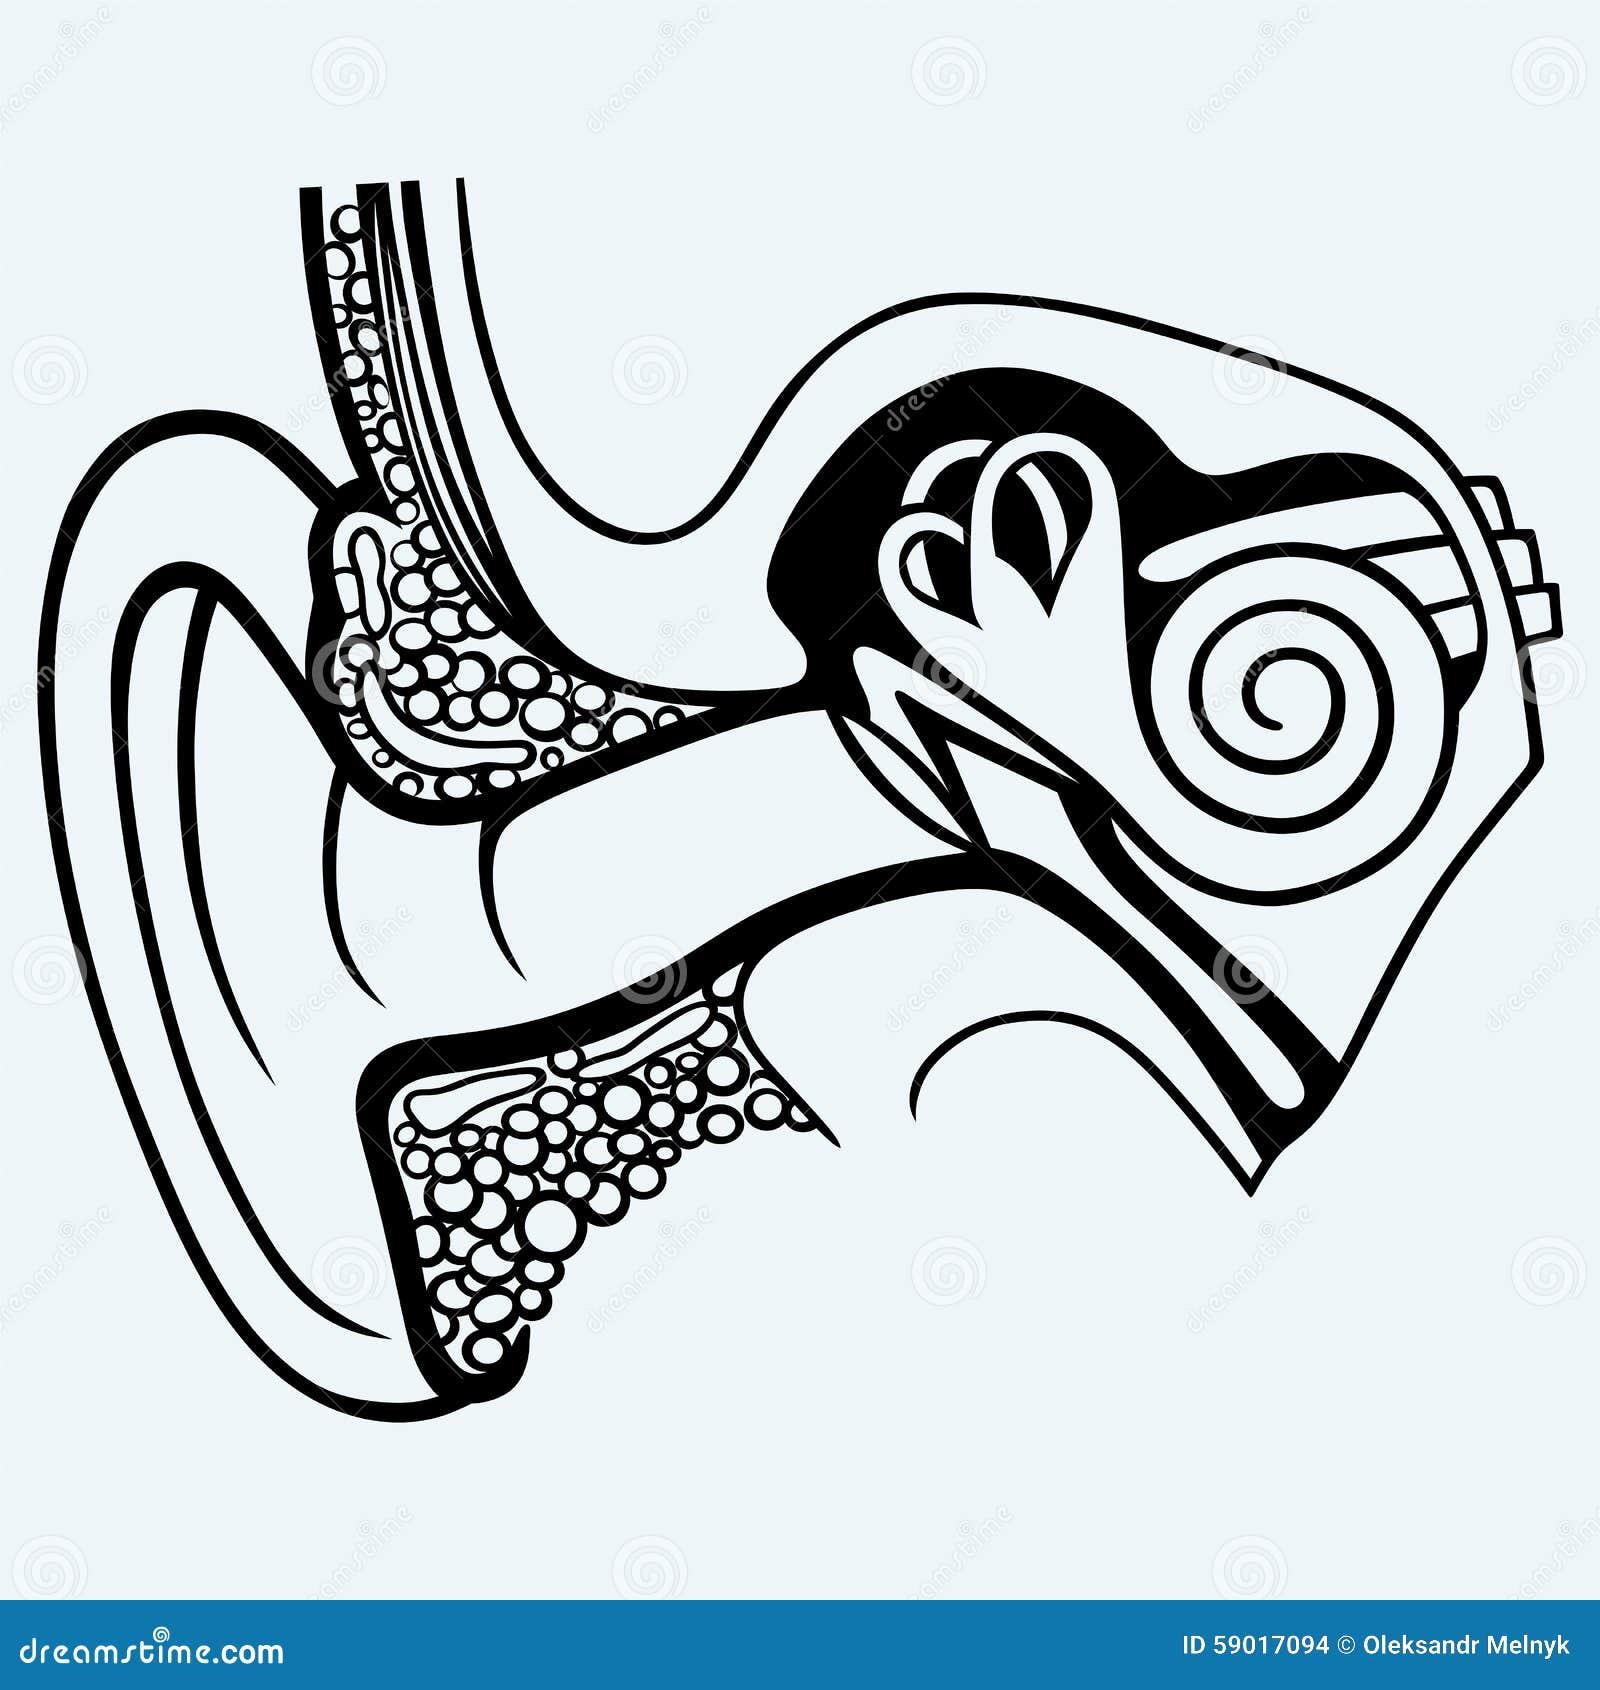 Human Internal Ear Diagram Stock Vector  Illustration Of